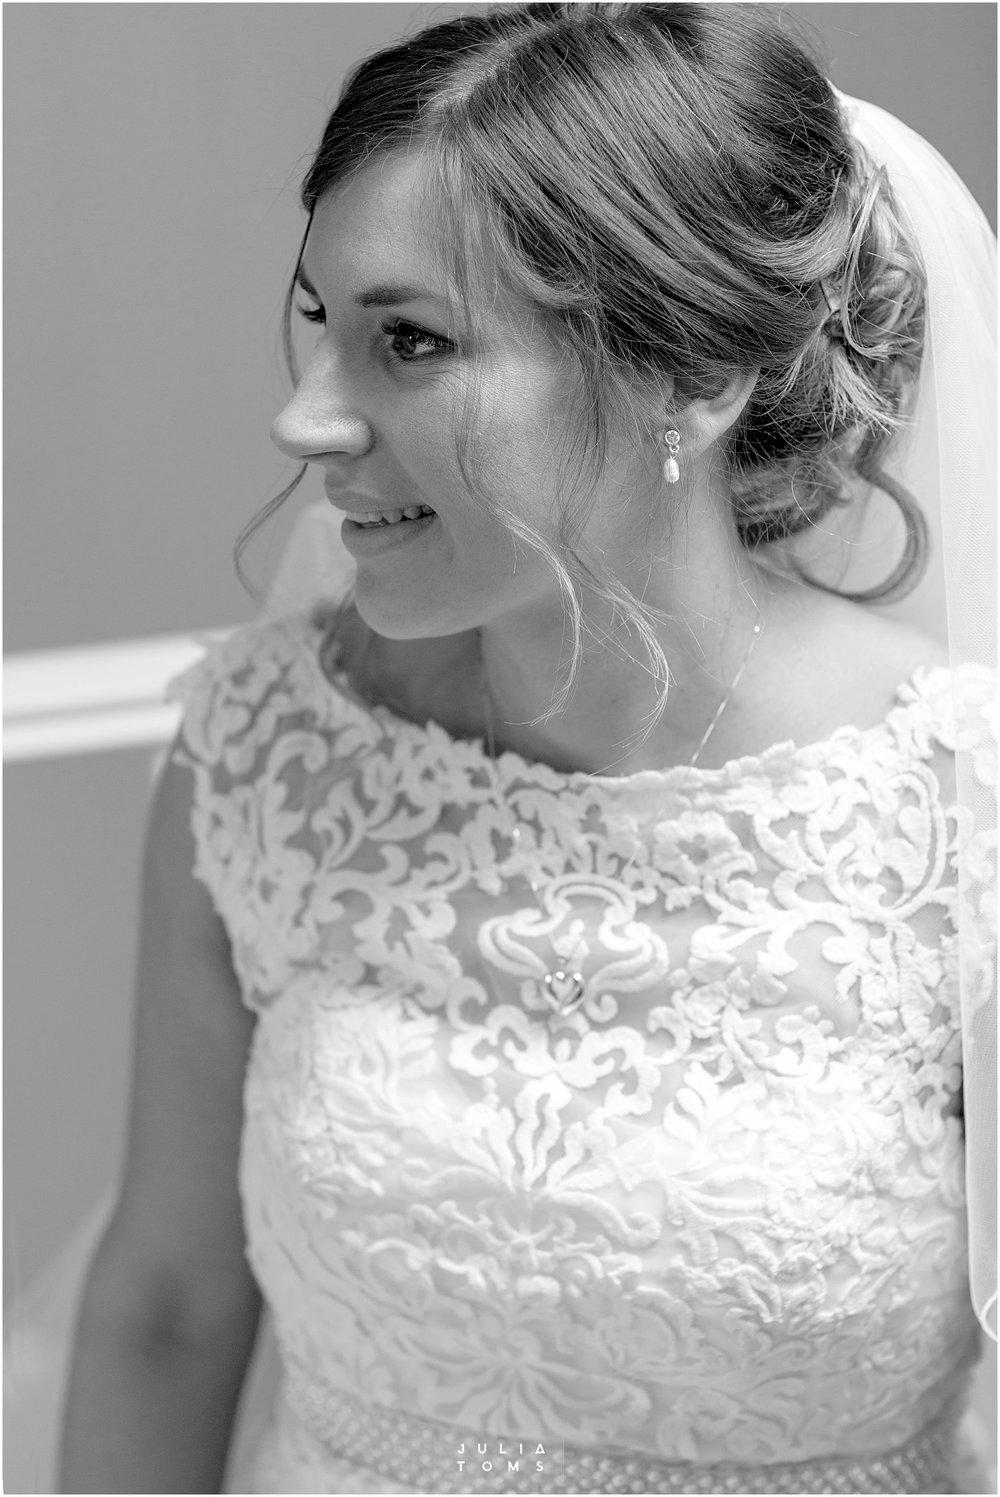 Julia_toms_chichester_wedding_photographer_002.jpg